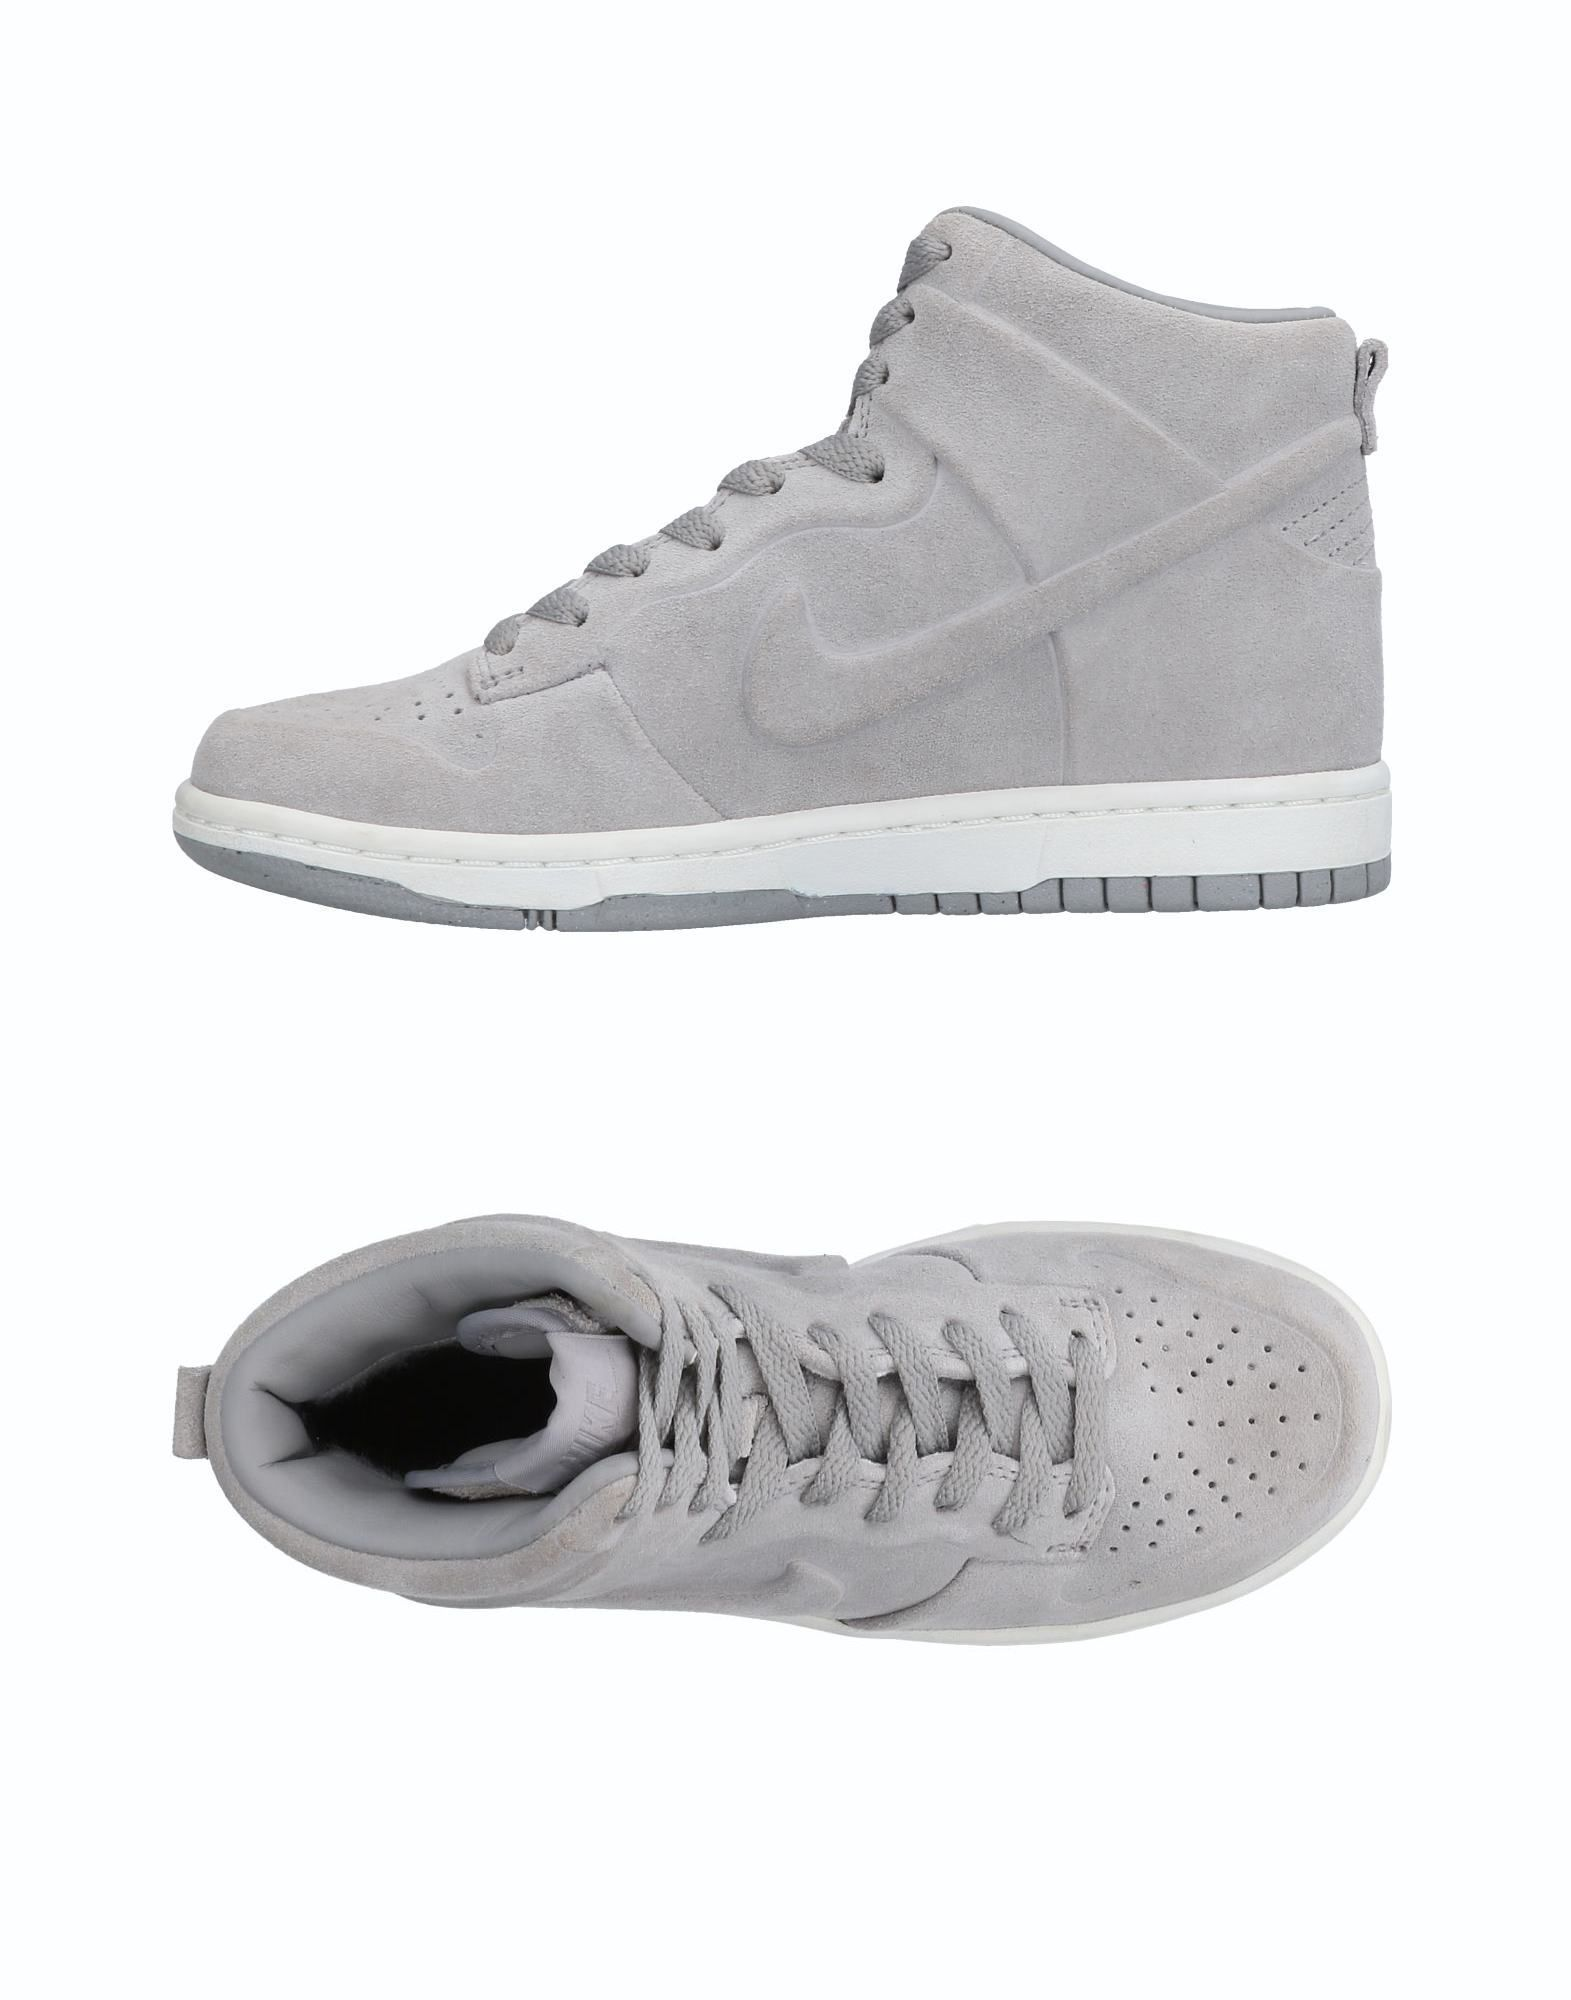 Moda Ginnastica Scarpe da Ginnastica Moda Nike Donna - 11506206OM 2d660f